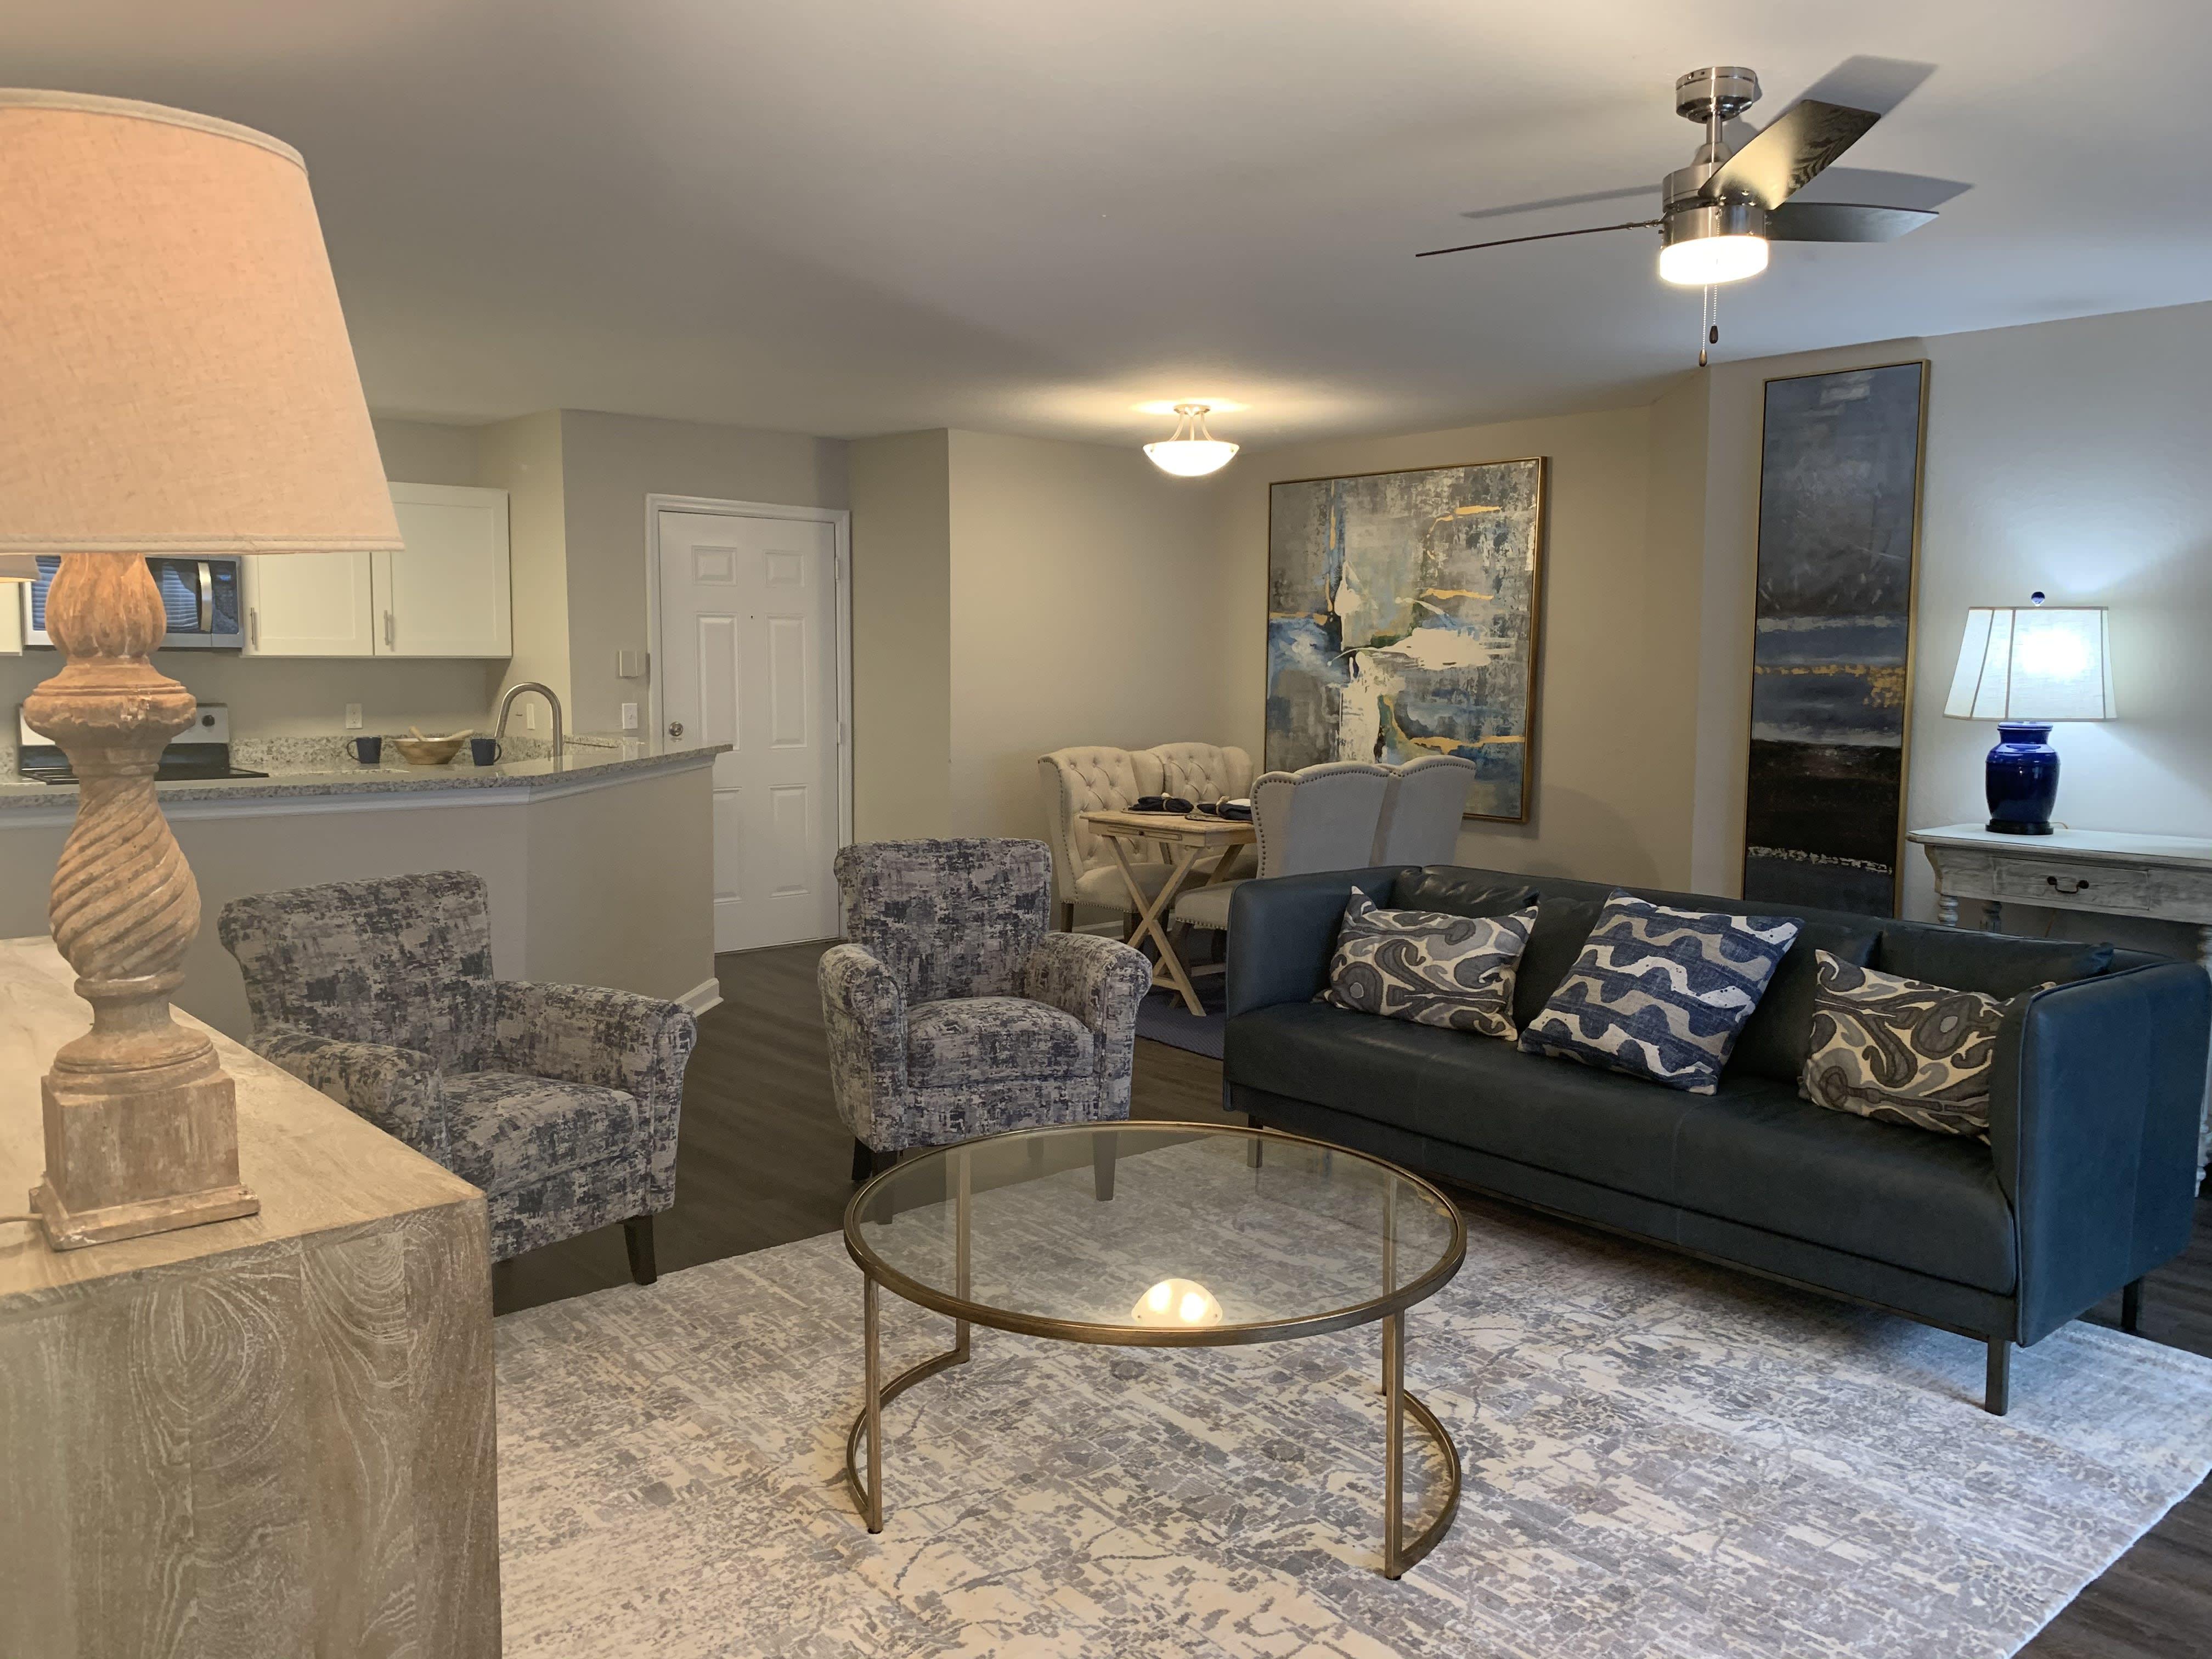 Furnished living room in 2BR